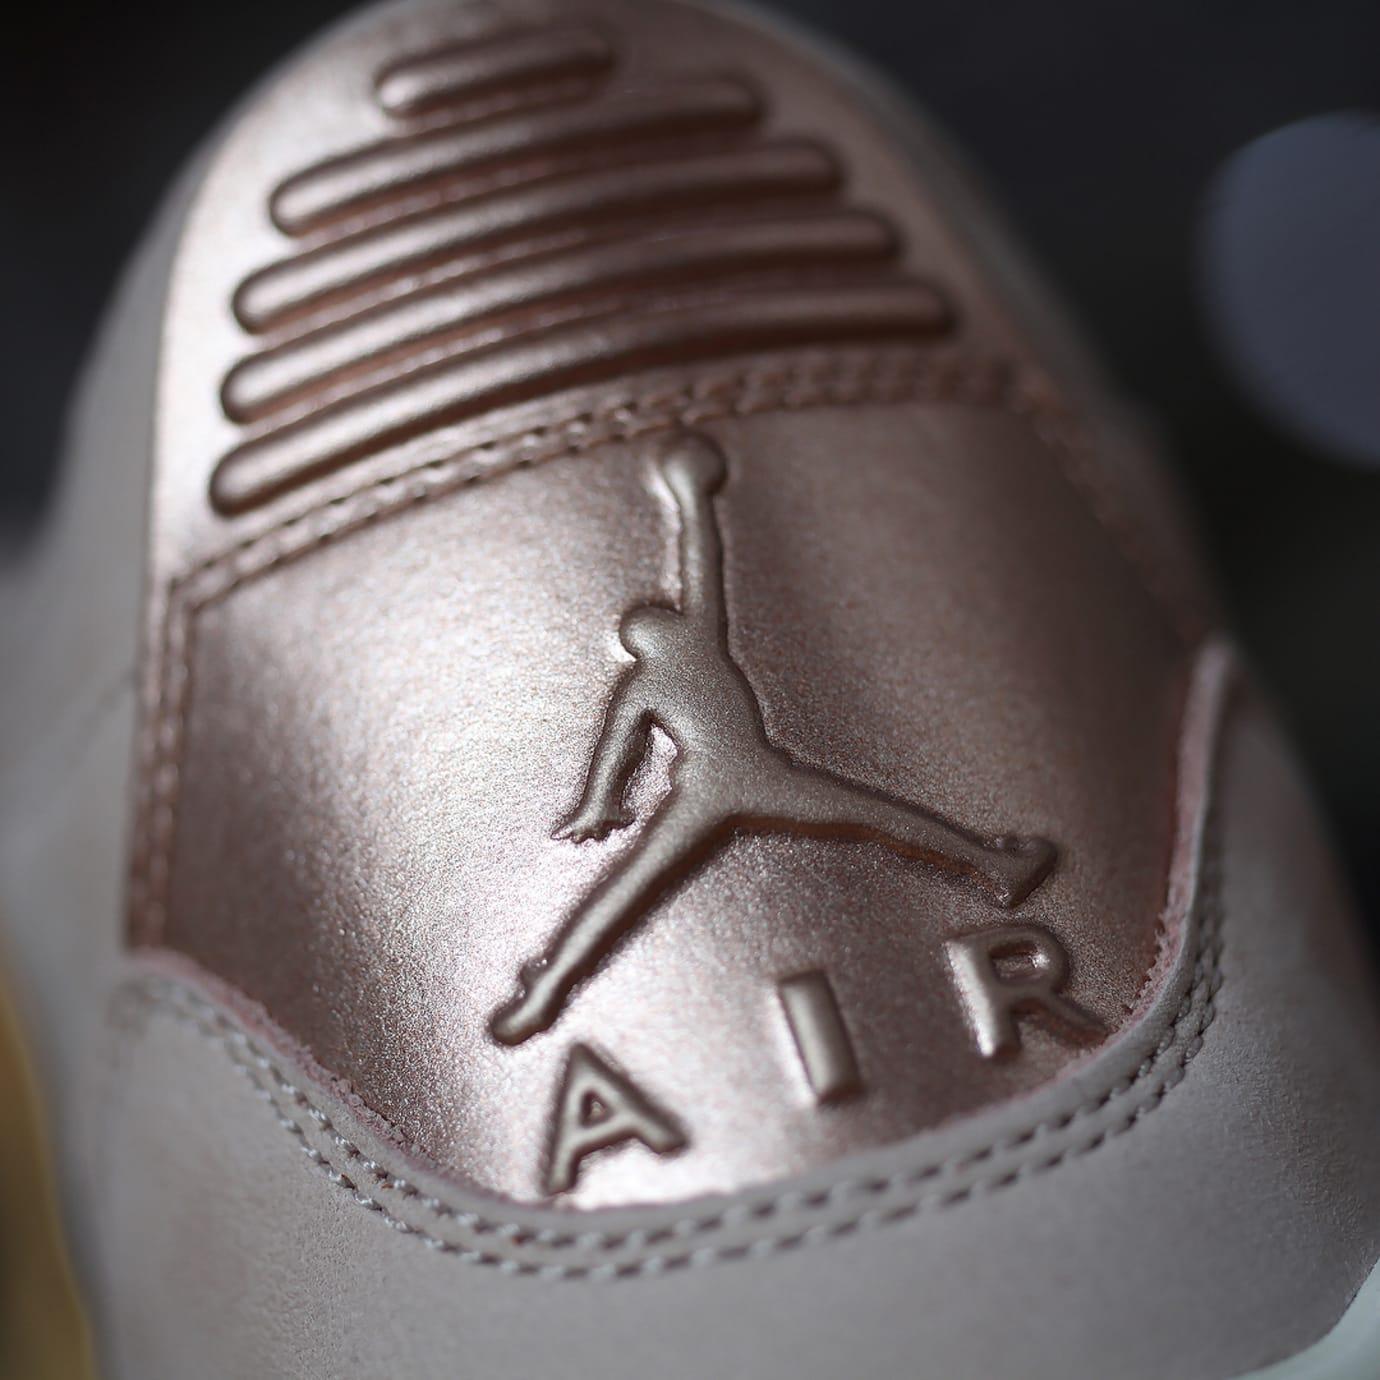 3df69b6a9e0 Image via GC911 · Air Jordan 3 III Women's Particle Beige Release Date  AH7859-205 Heel Logo